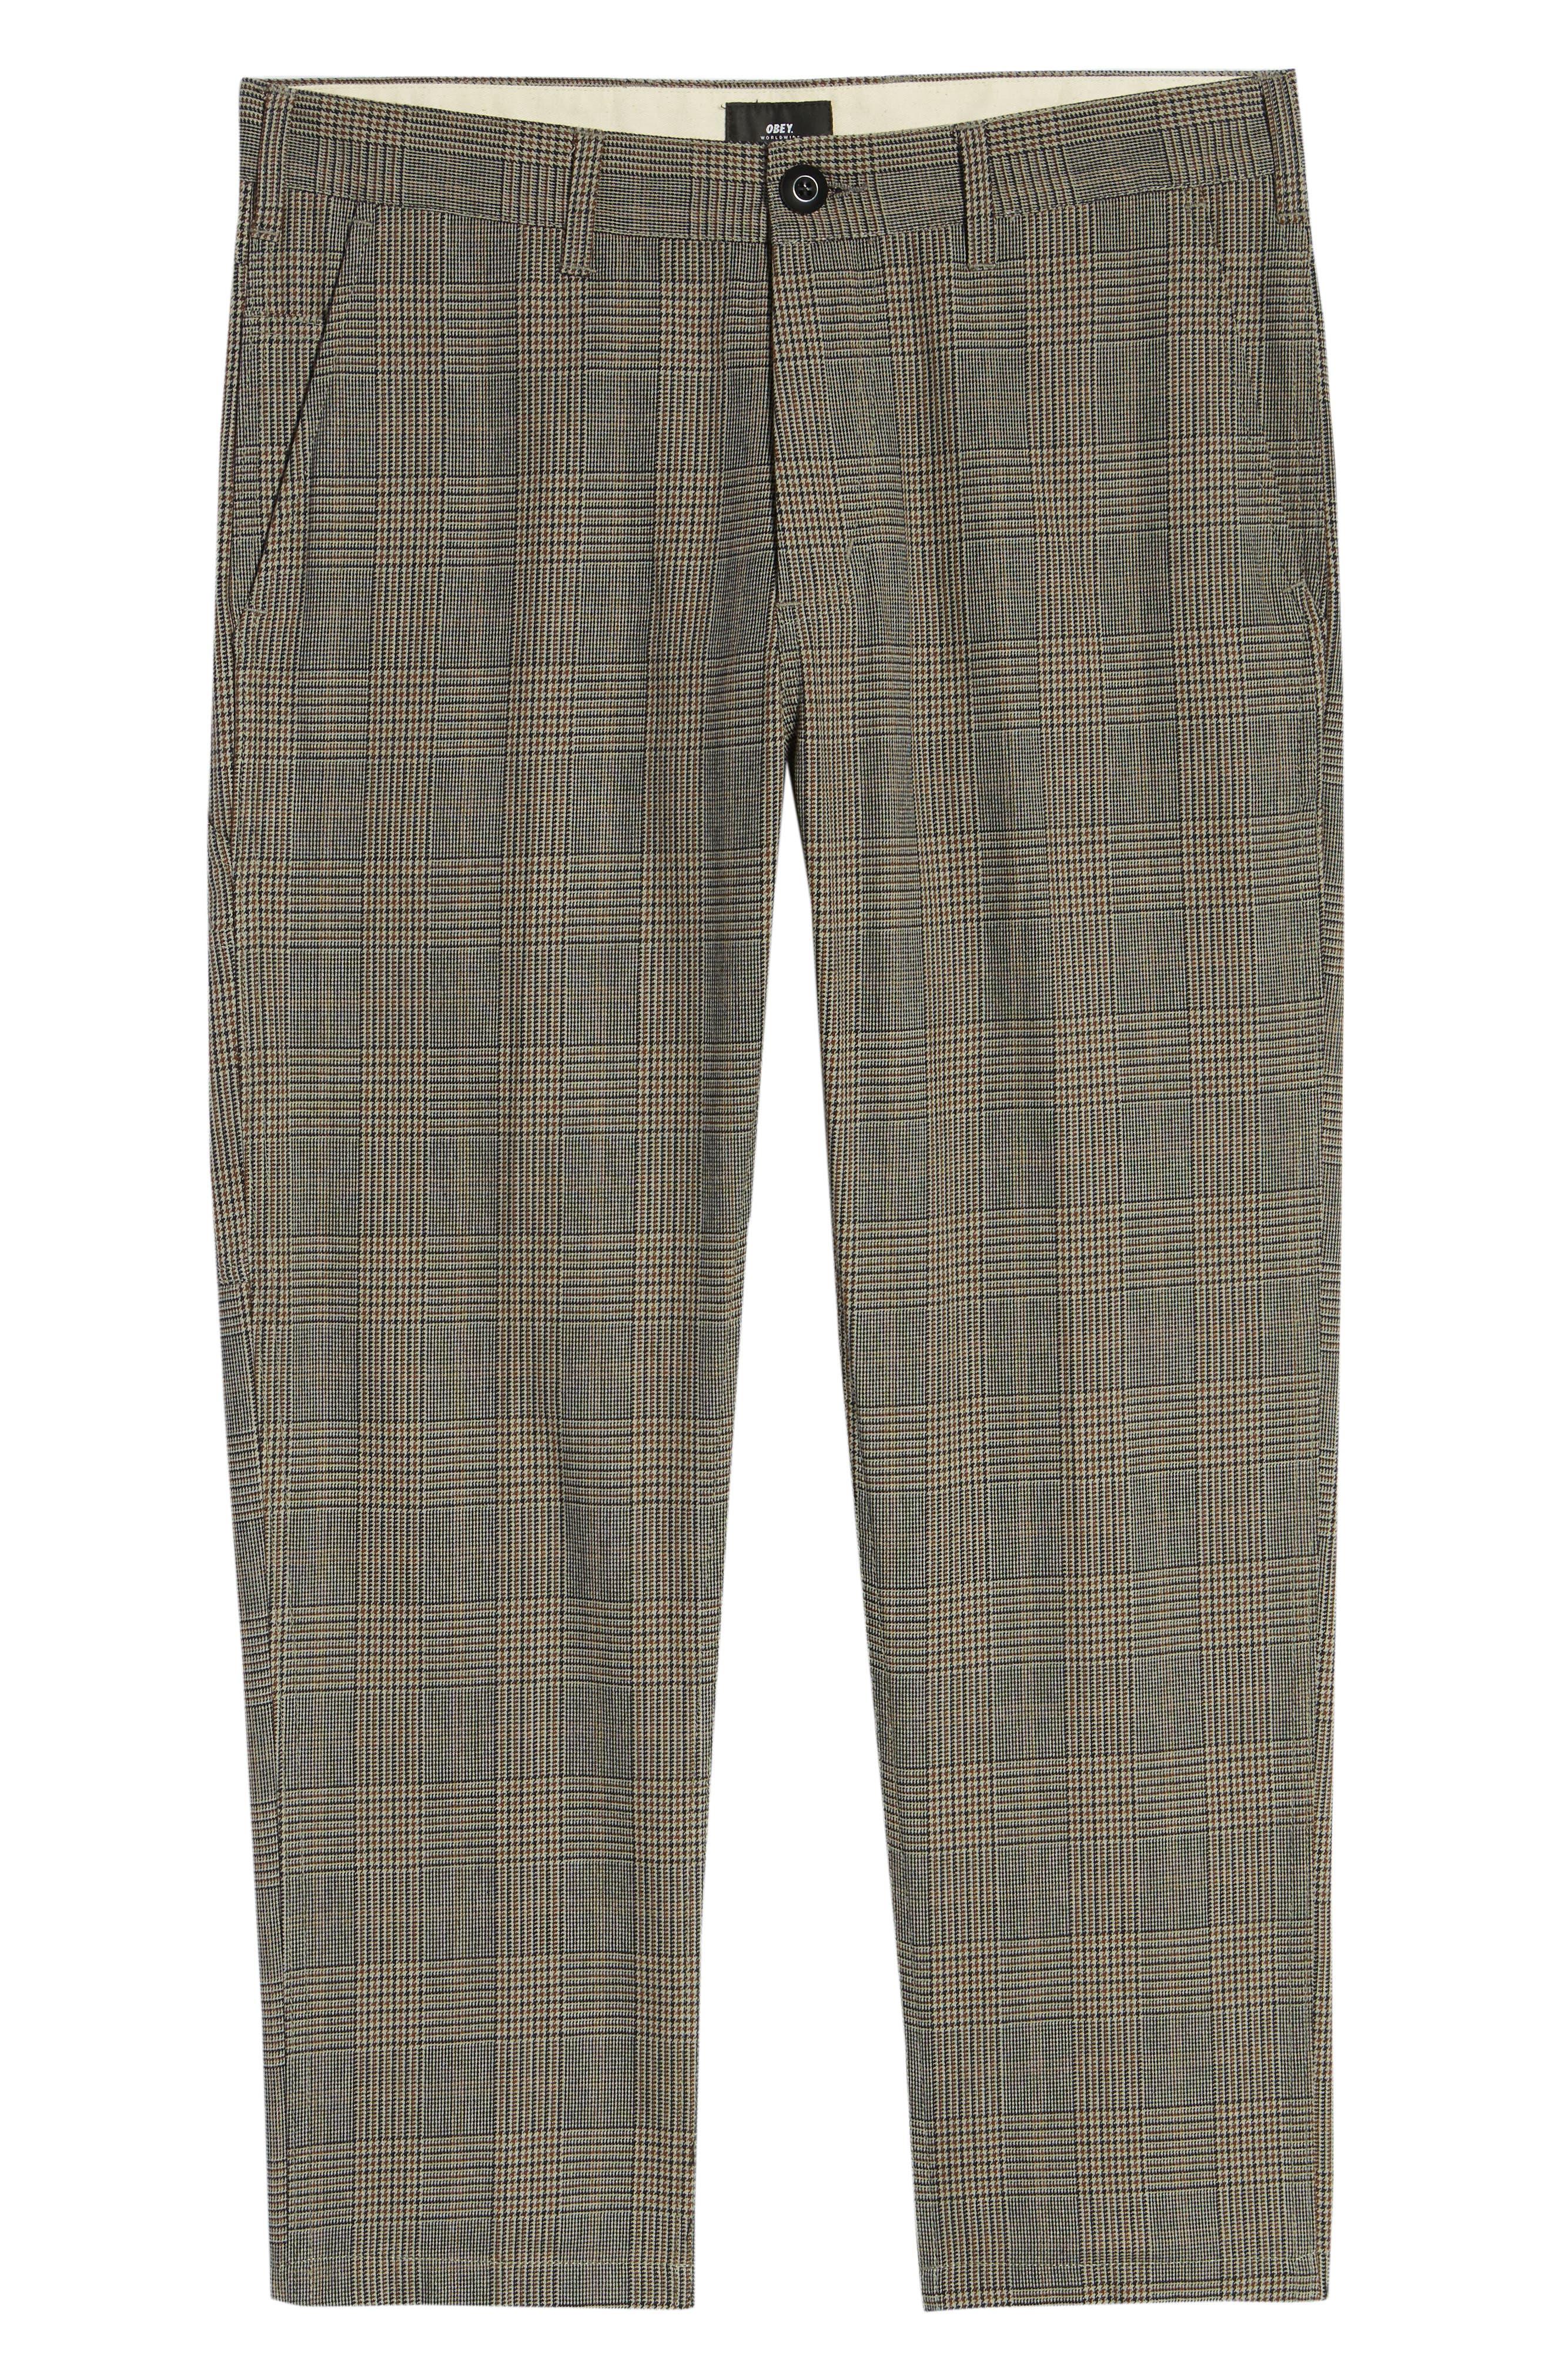 Straggler Glen Plaid Carpenter Pants,                             Alternate thumbnail 6, color,                             BLACK MULTI